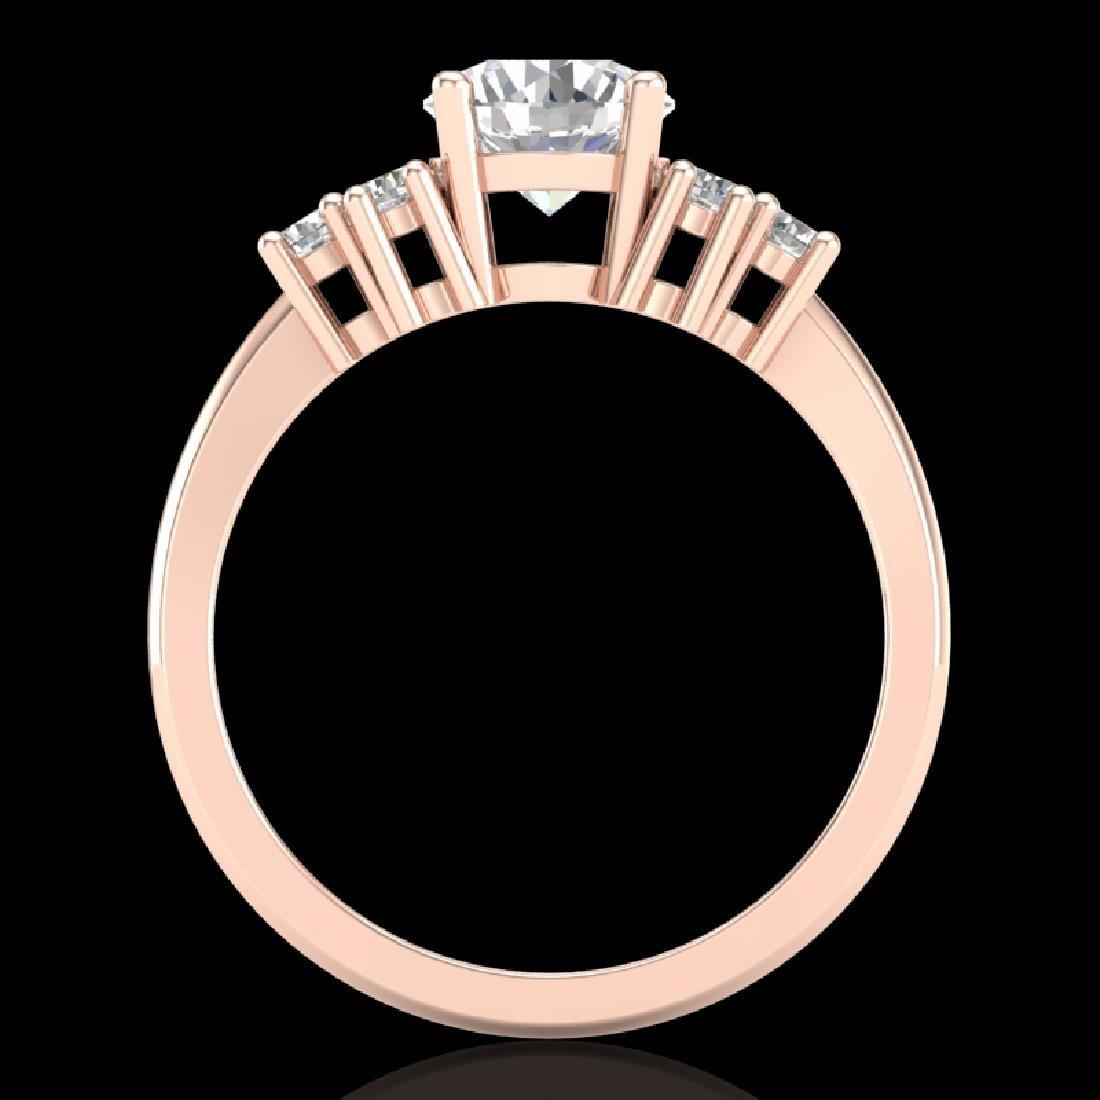 1.5 CTW VS/SI Diamond Solitaire Ring 18K Rose Gold - 2